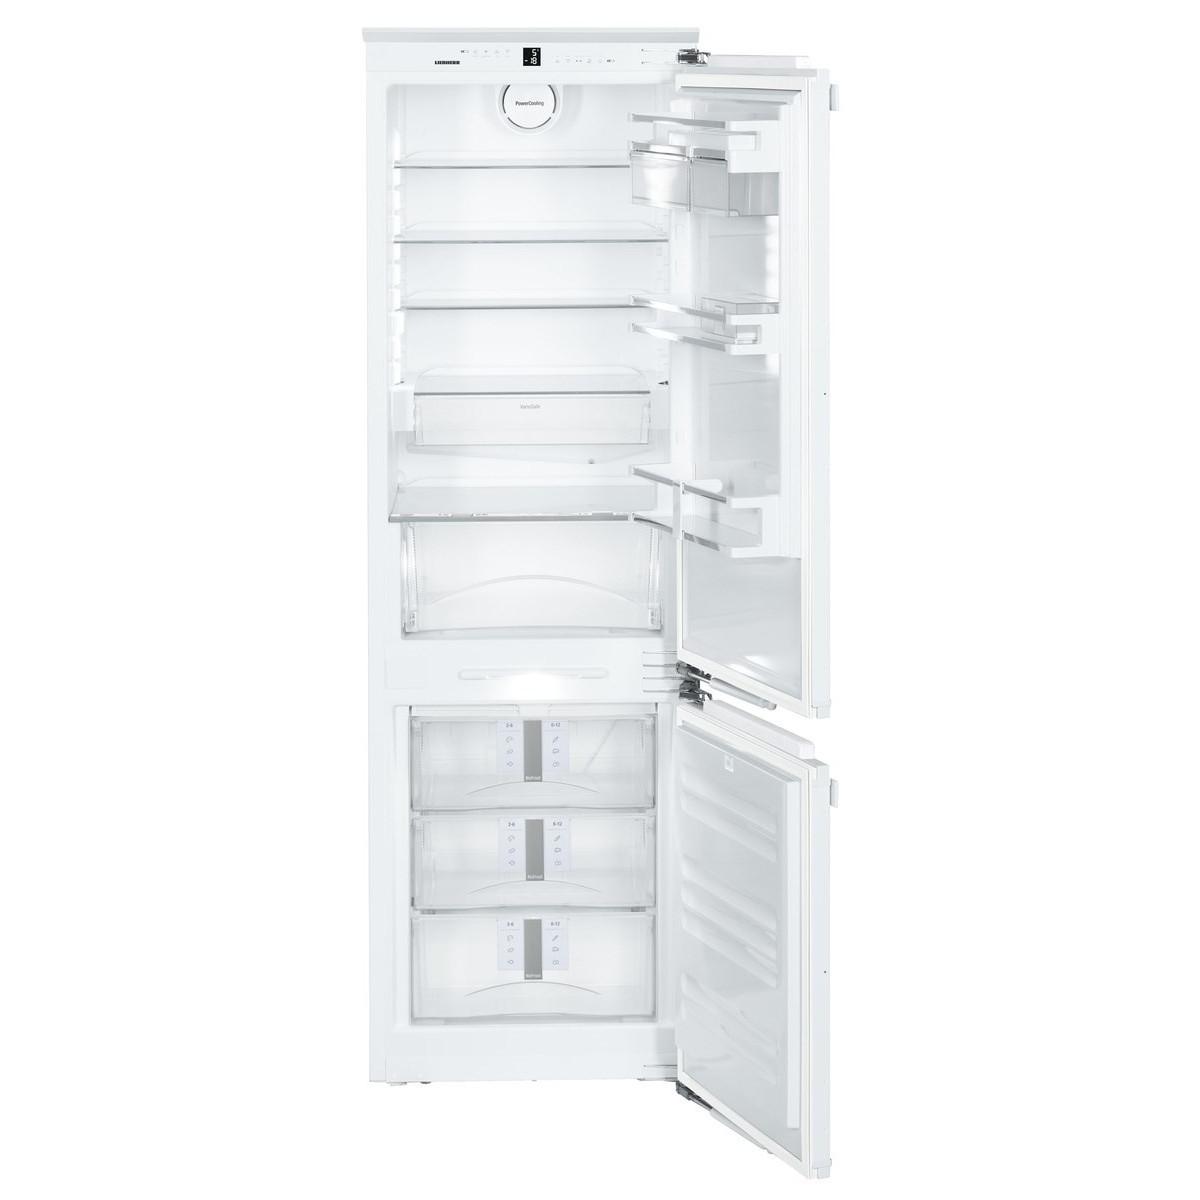 liebherr sicn 3386 premium nofrost integrable fridge freezer discount appliance centre. Black Bedroom Furniture Sets. Home Design Ideas